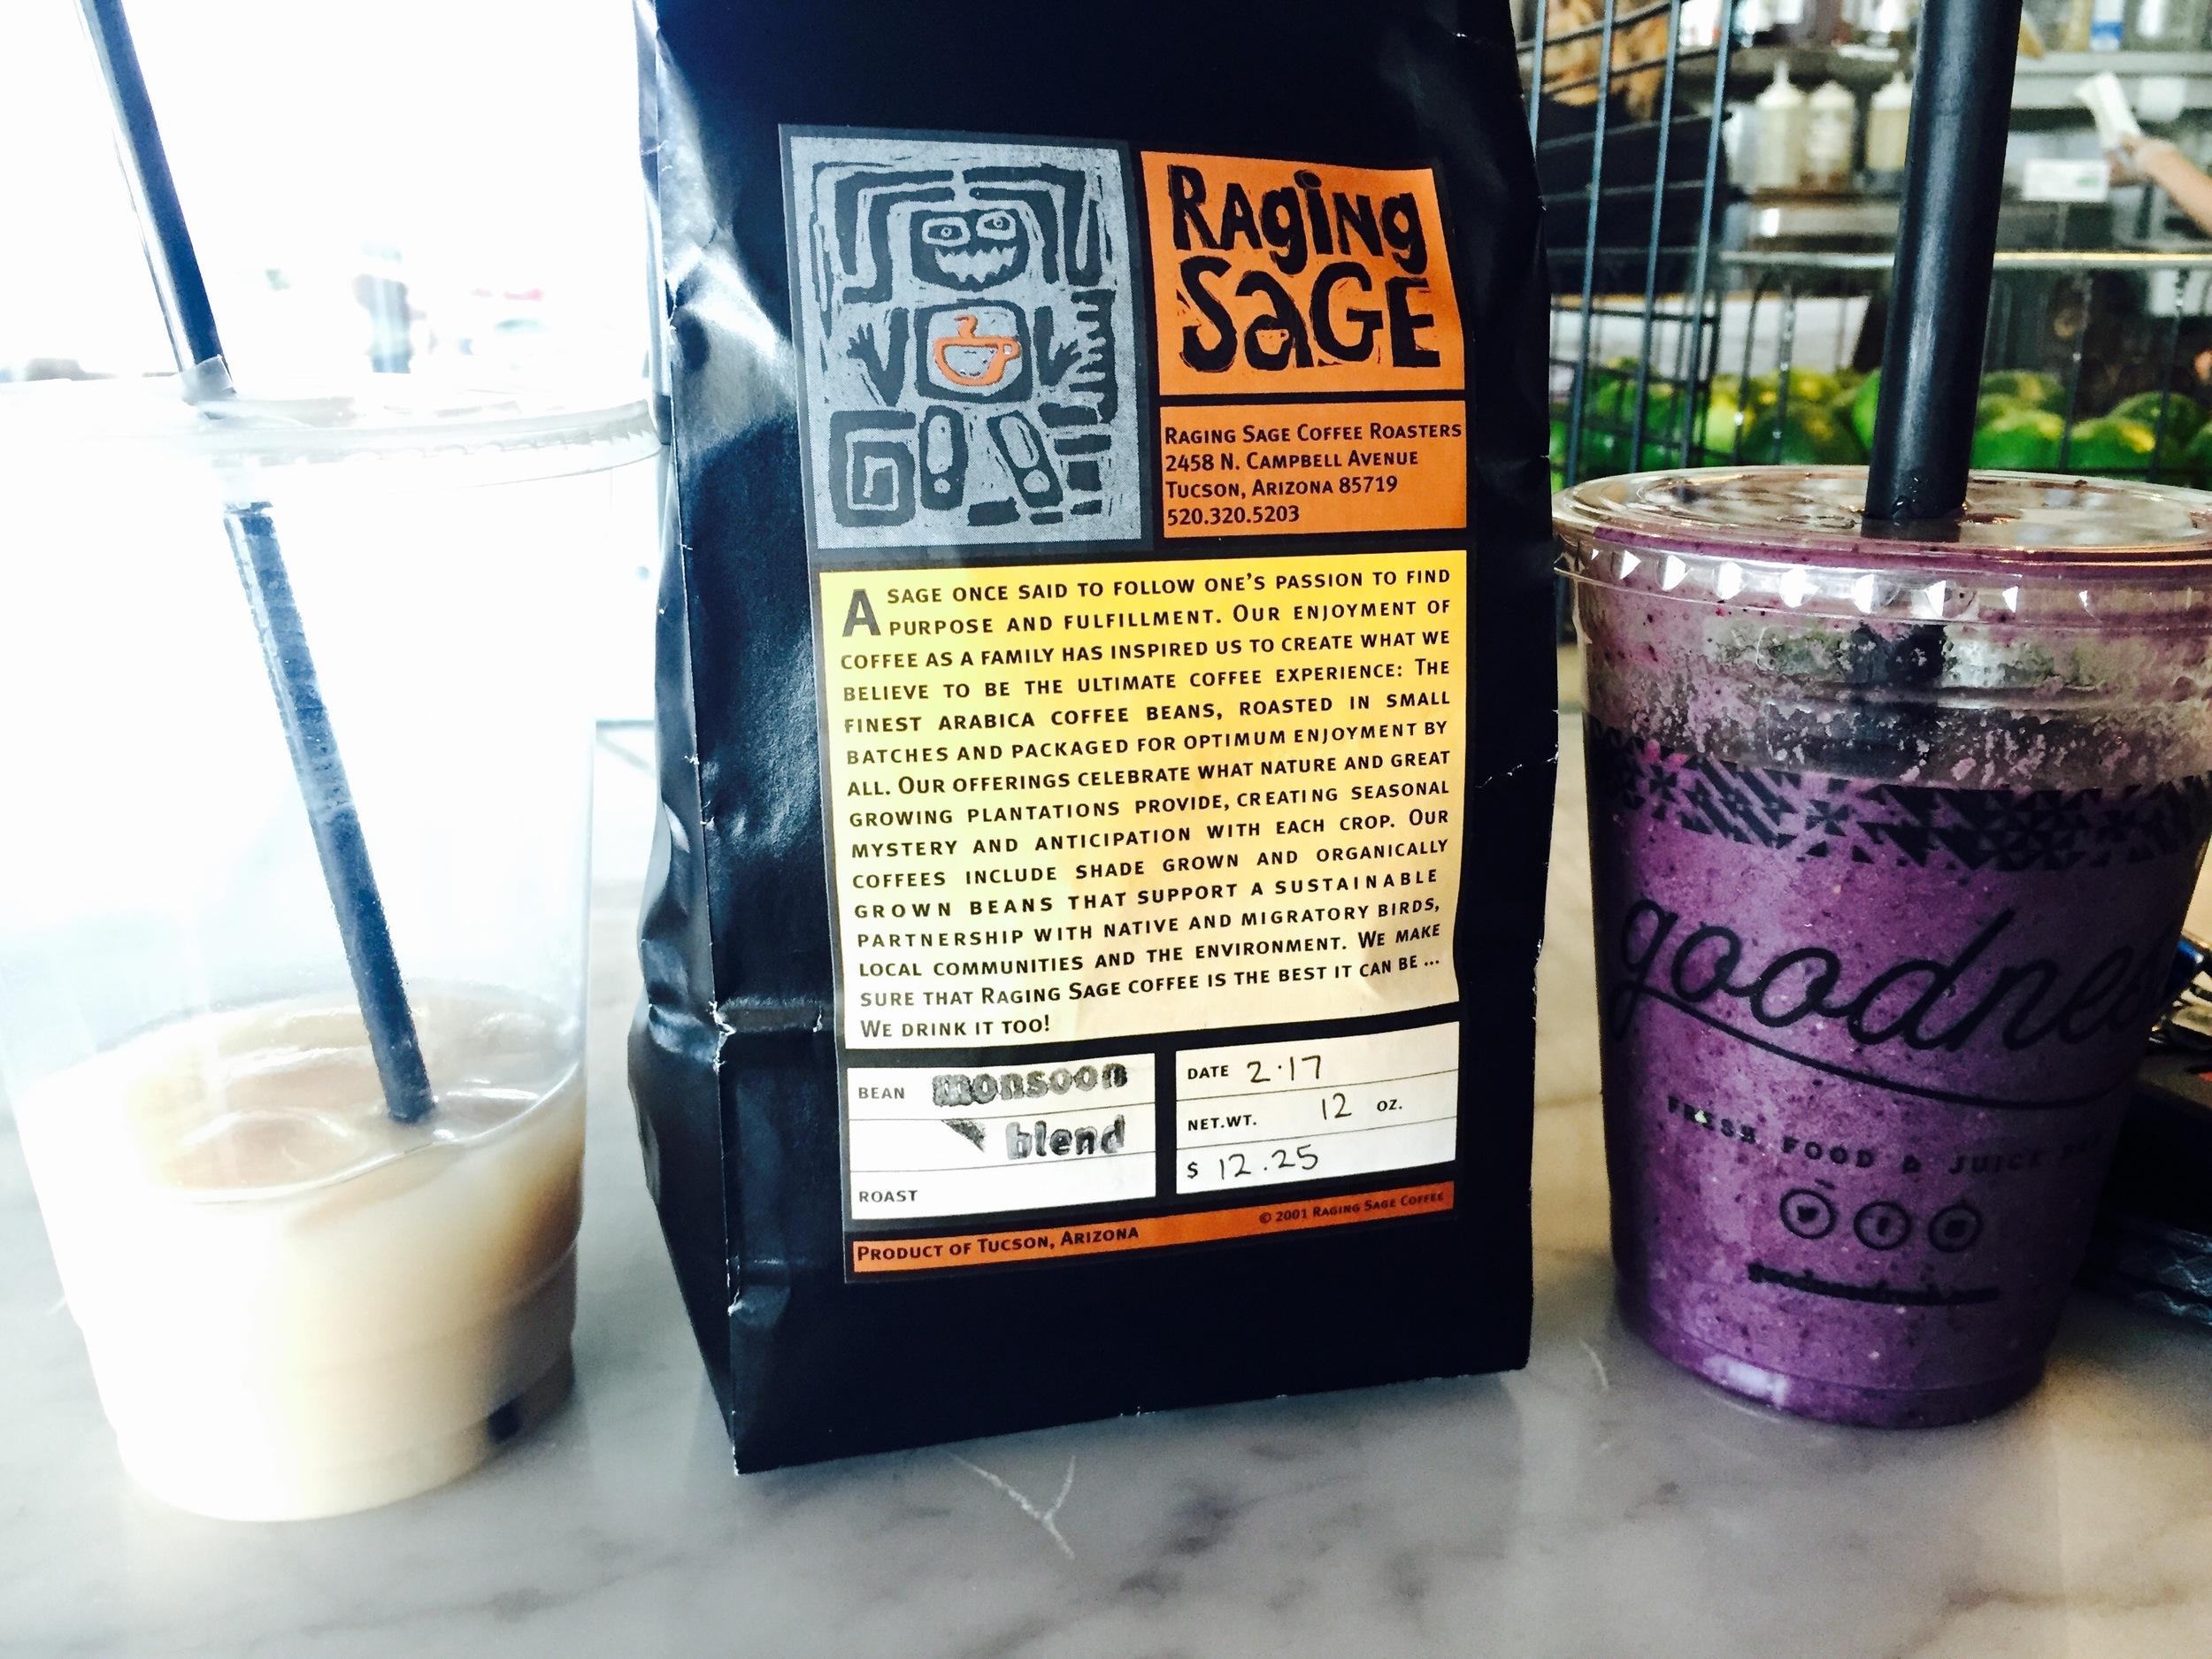 Raging Sage homemade chai tea latte | Raging Sage Monsoon Blend | The Goods smoothie